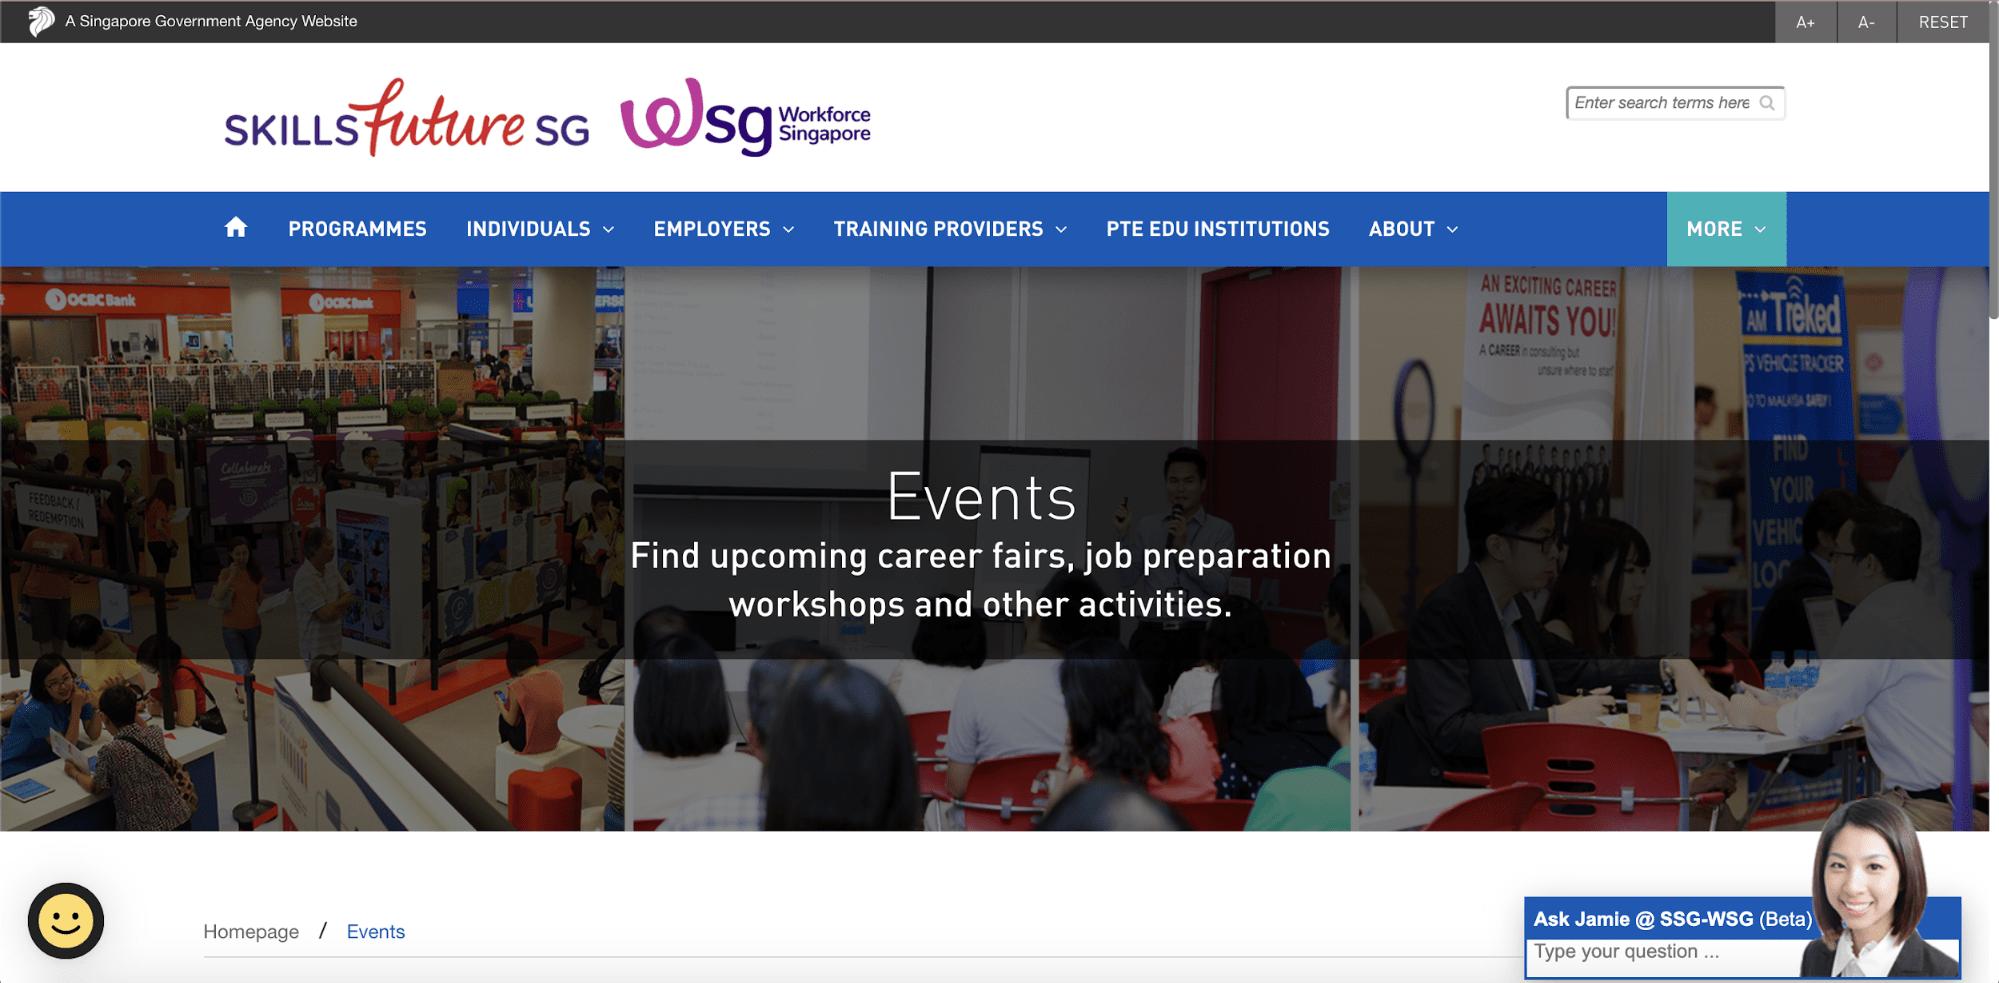 SkillsfutureSG Website